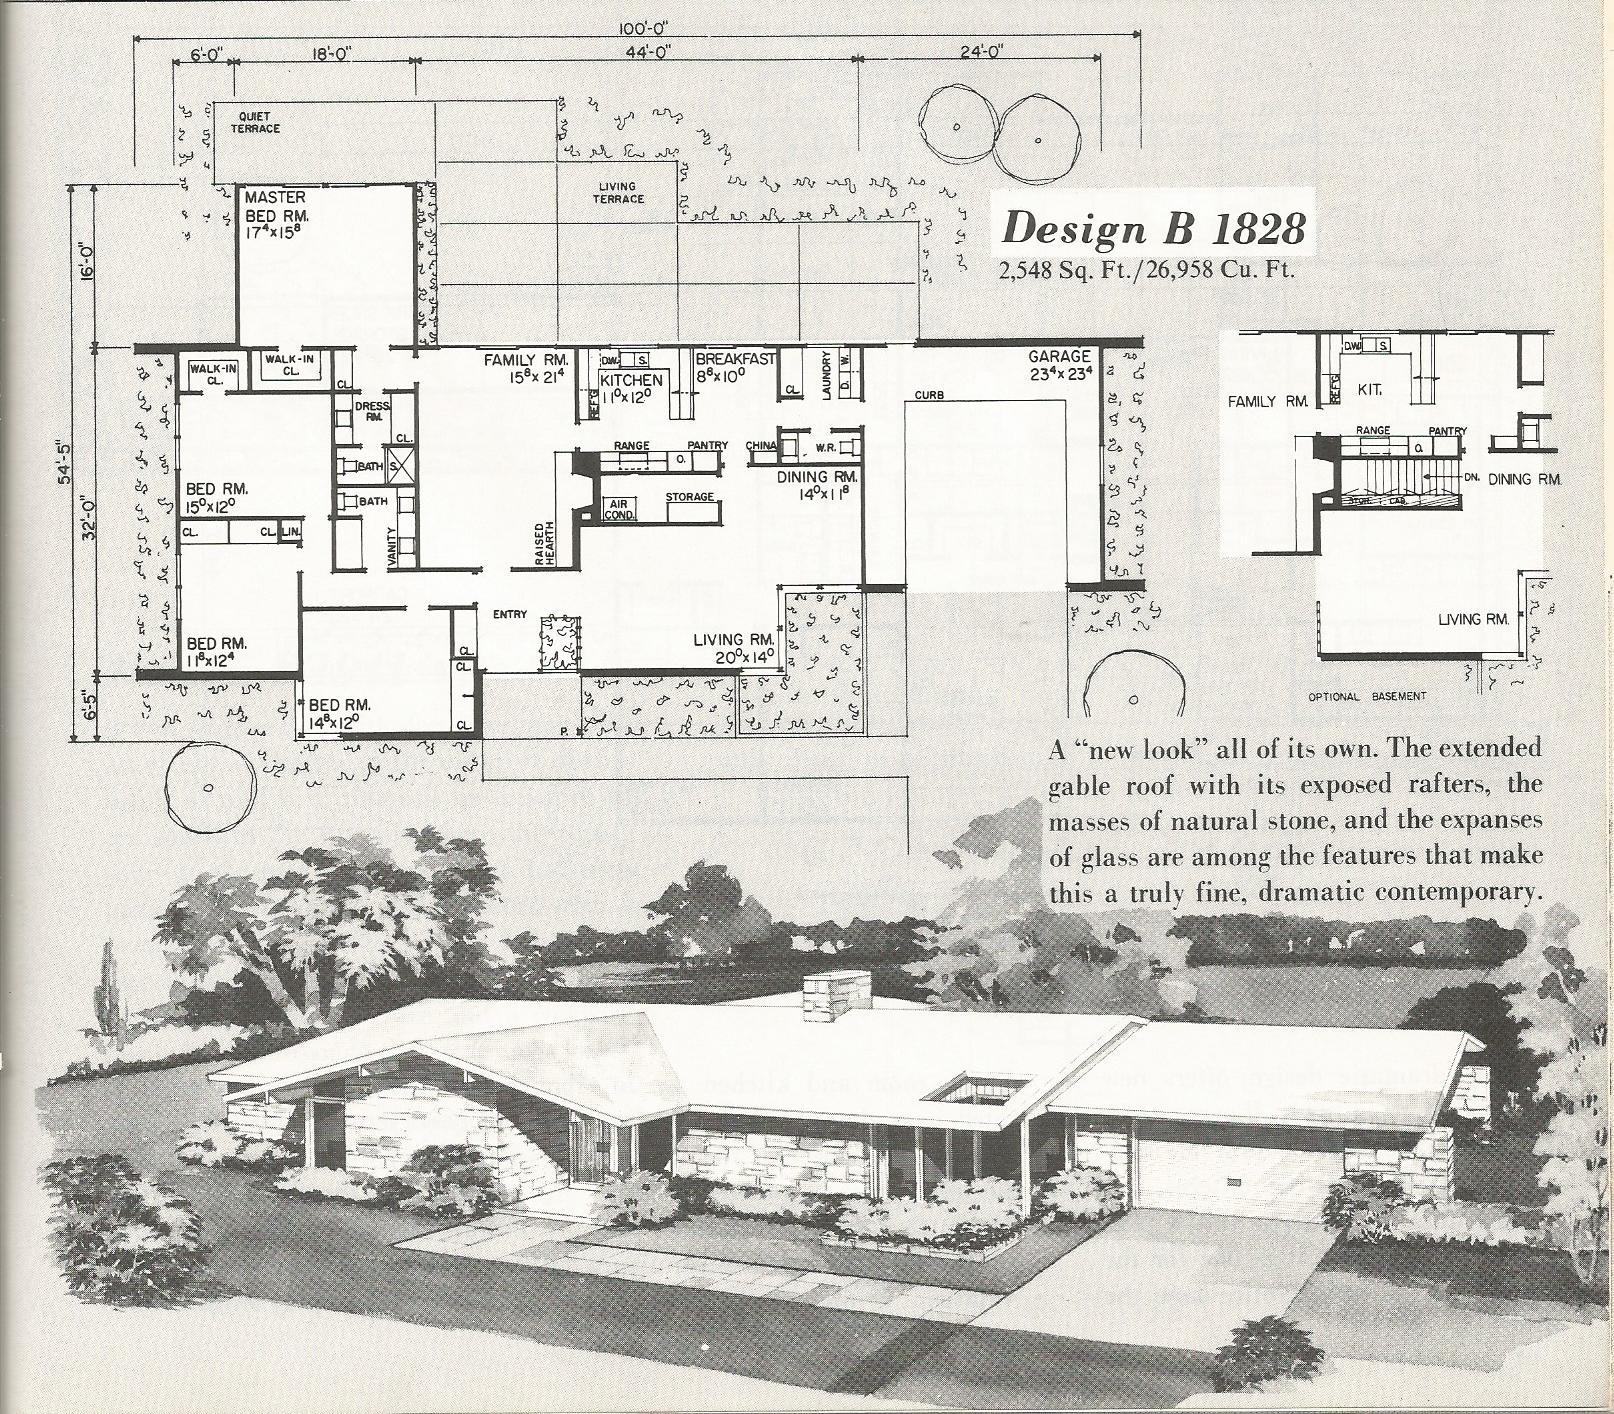 Vintage house plans 1828 antique alter ego for Century homes floor plans